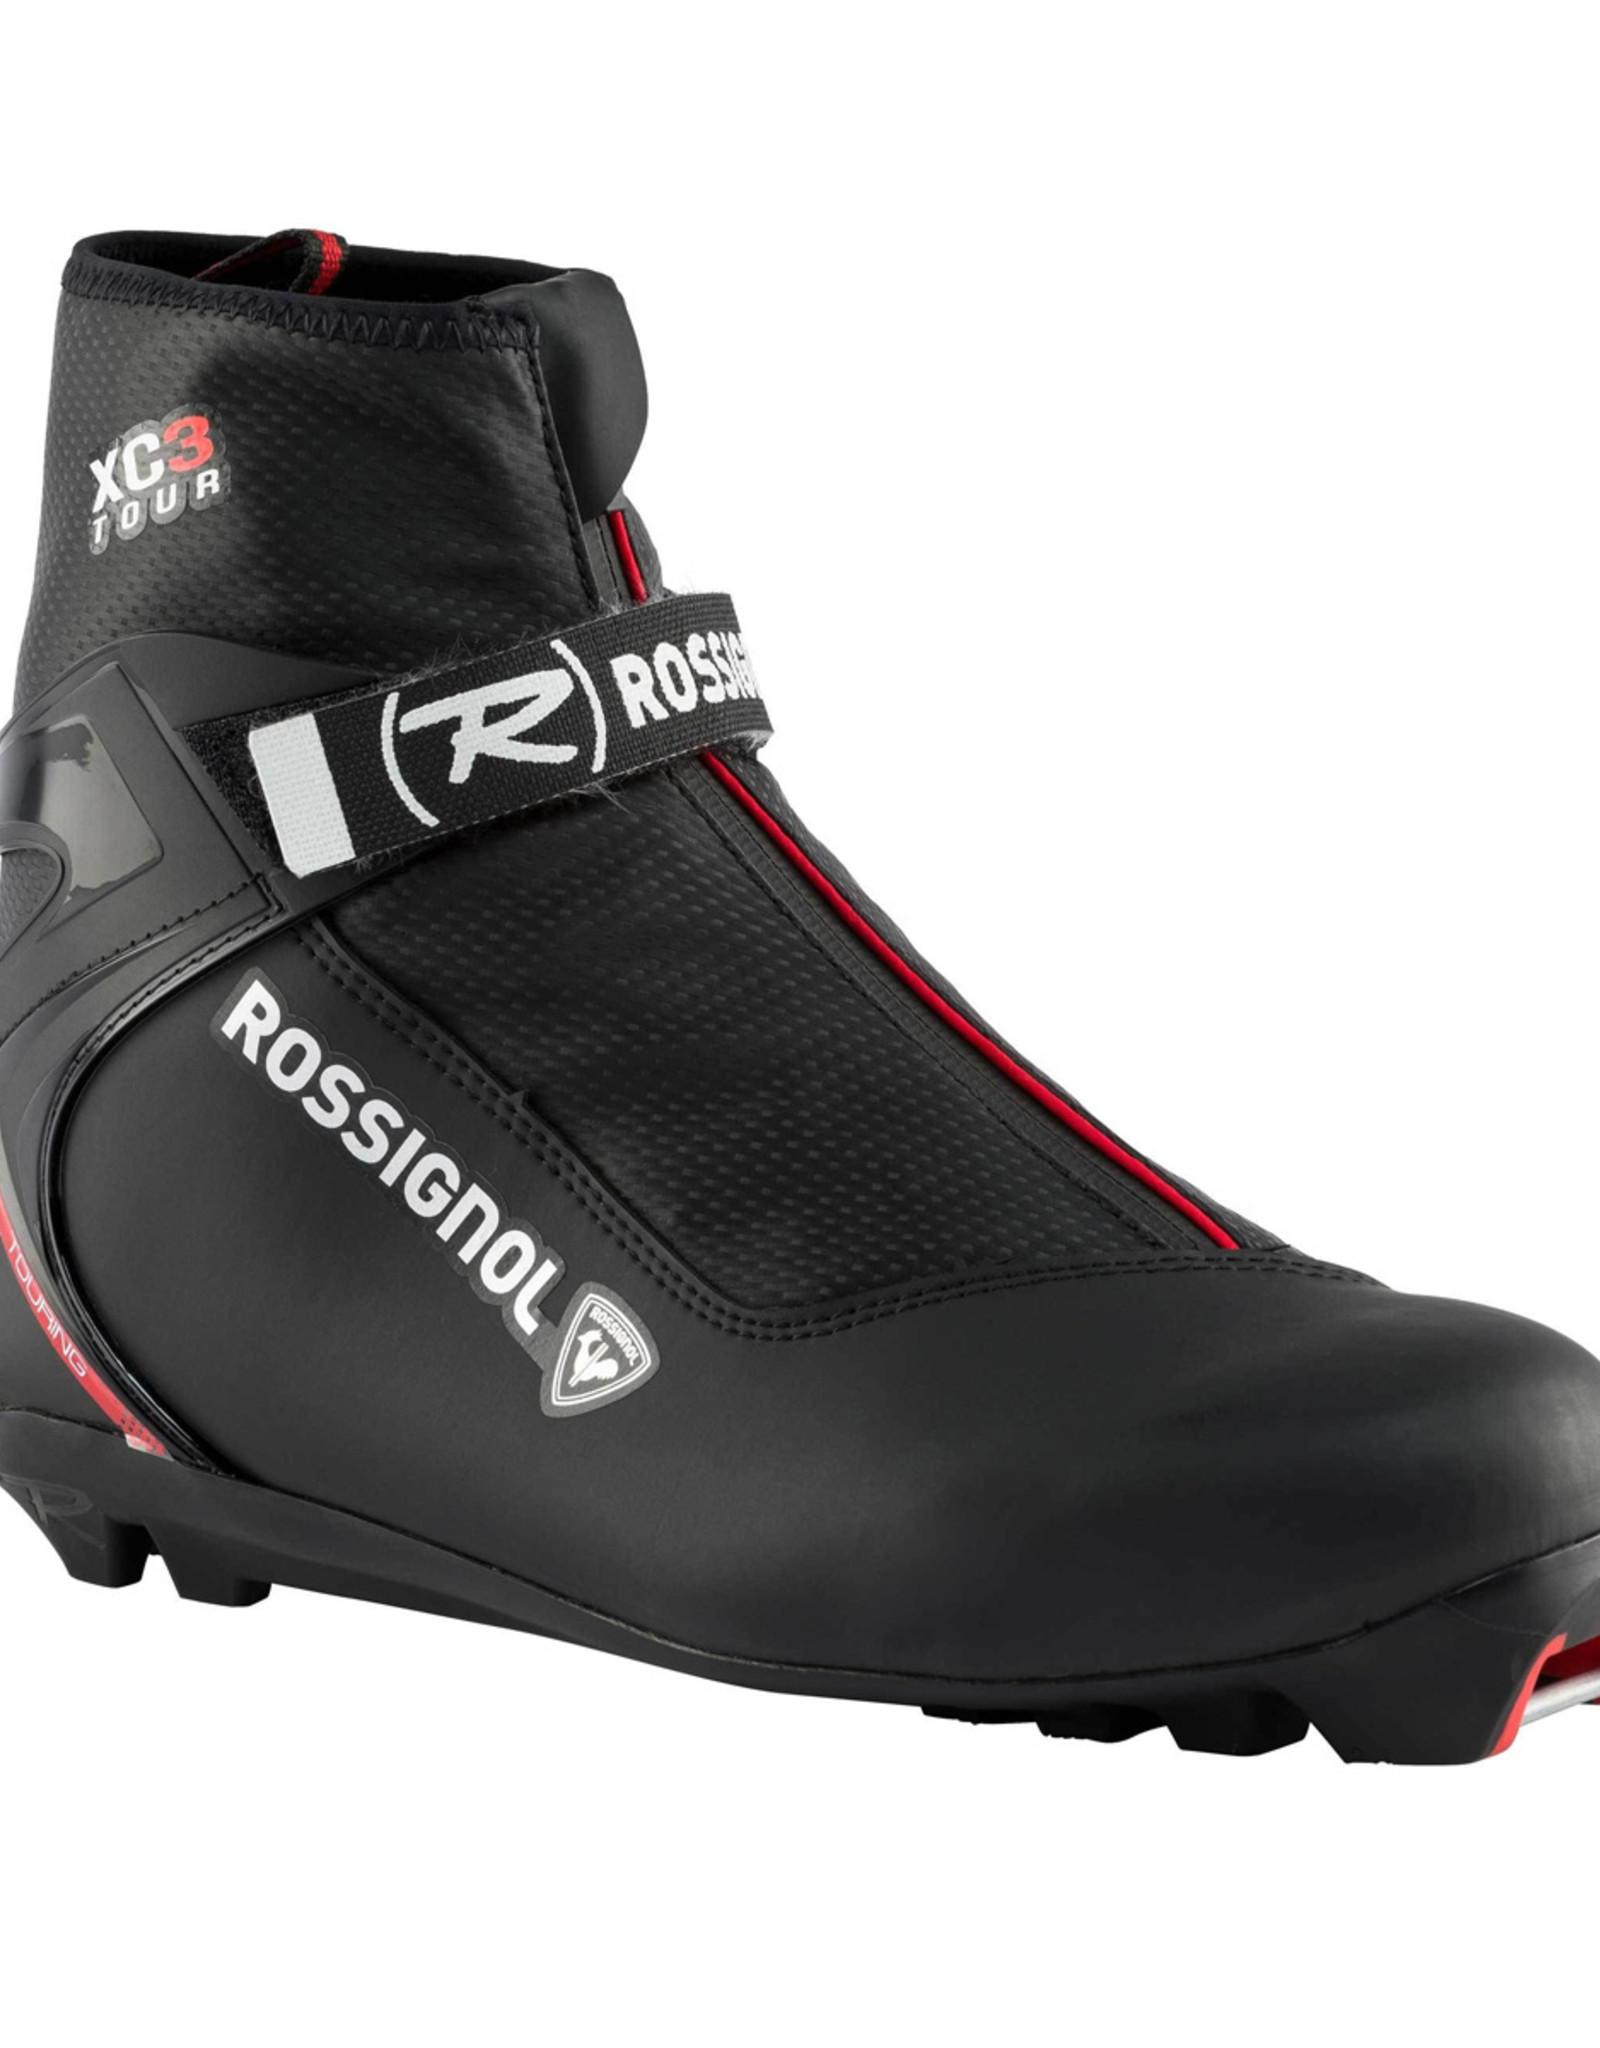 Rossignol Bottes Ski de Fond Rossignol XC-3